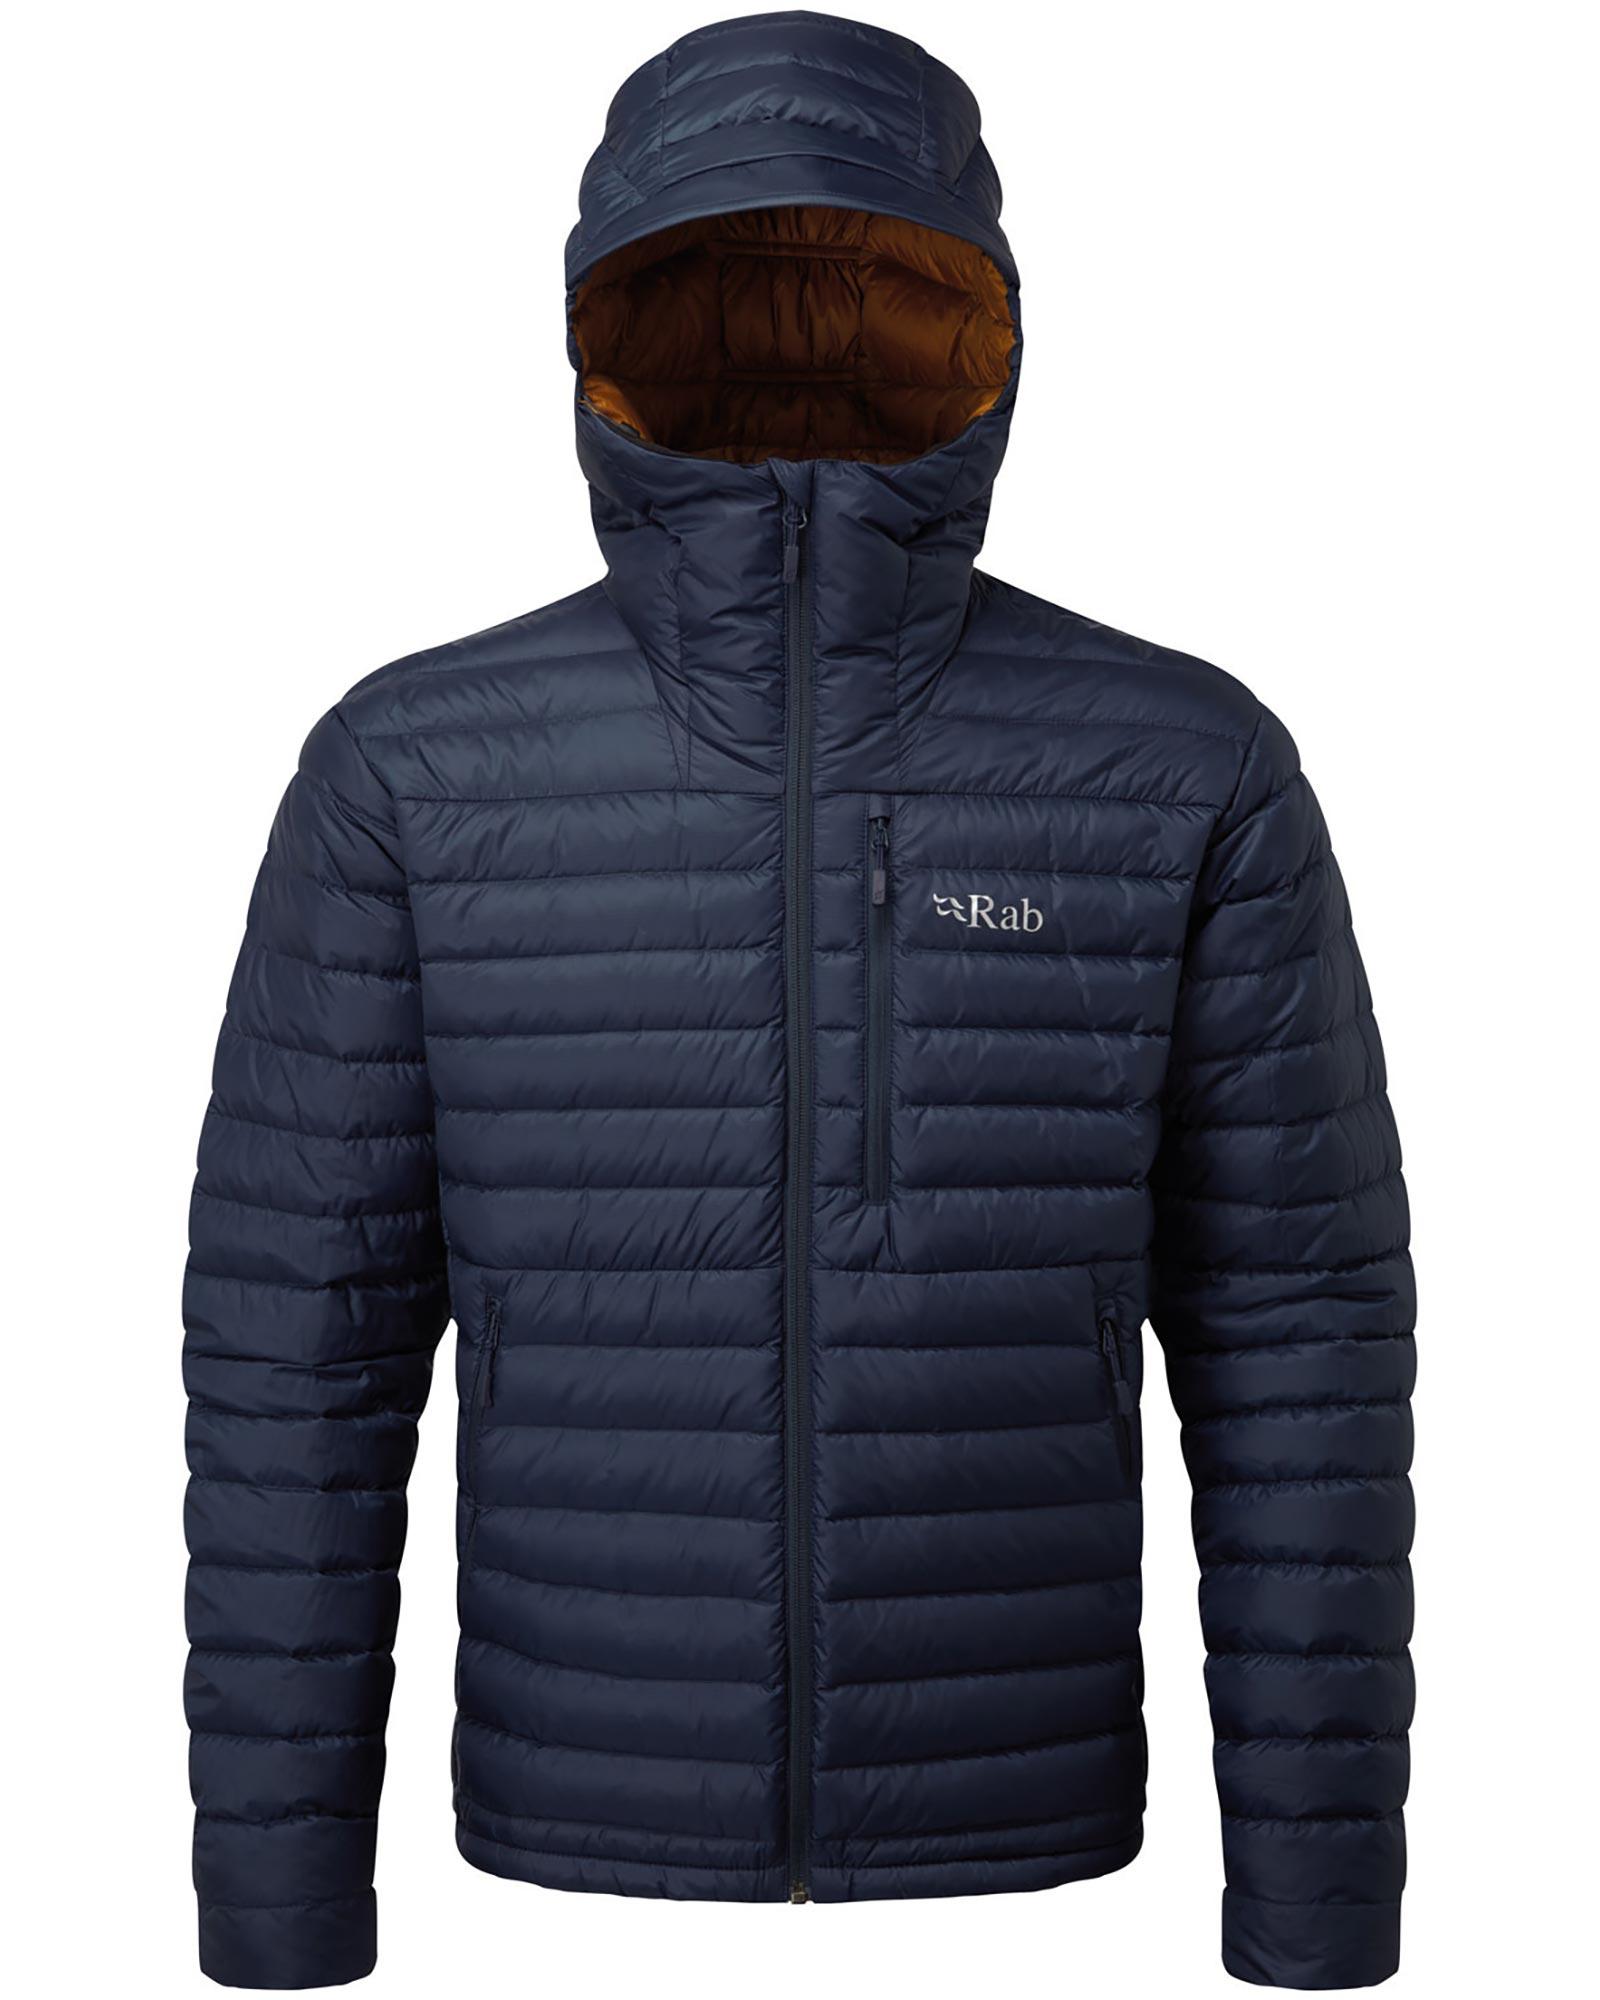 Rab Men's Pertex Microlight Alpine Jacket 0